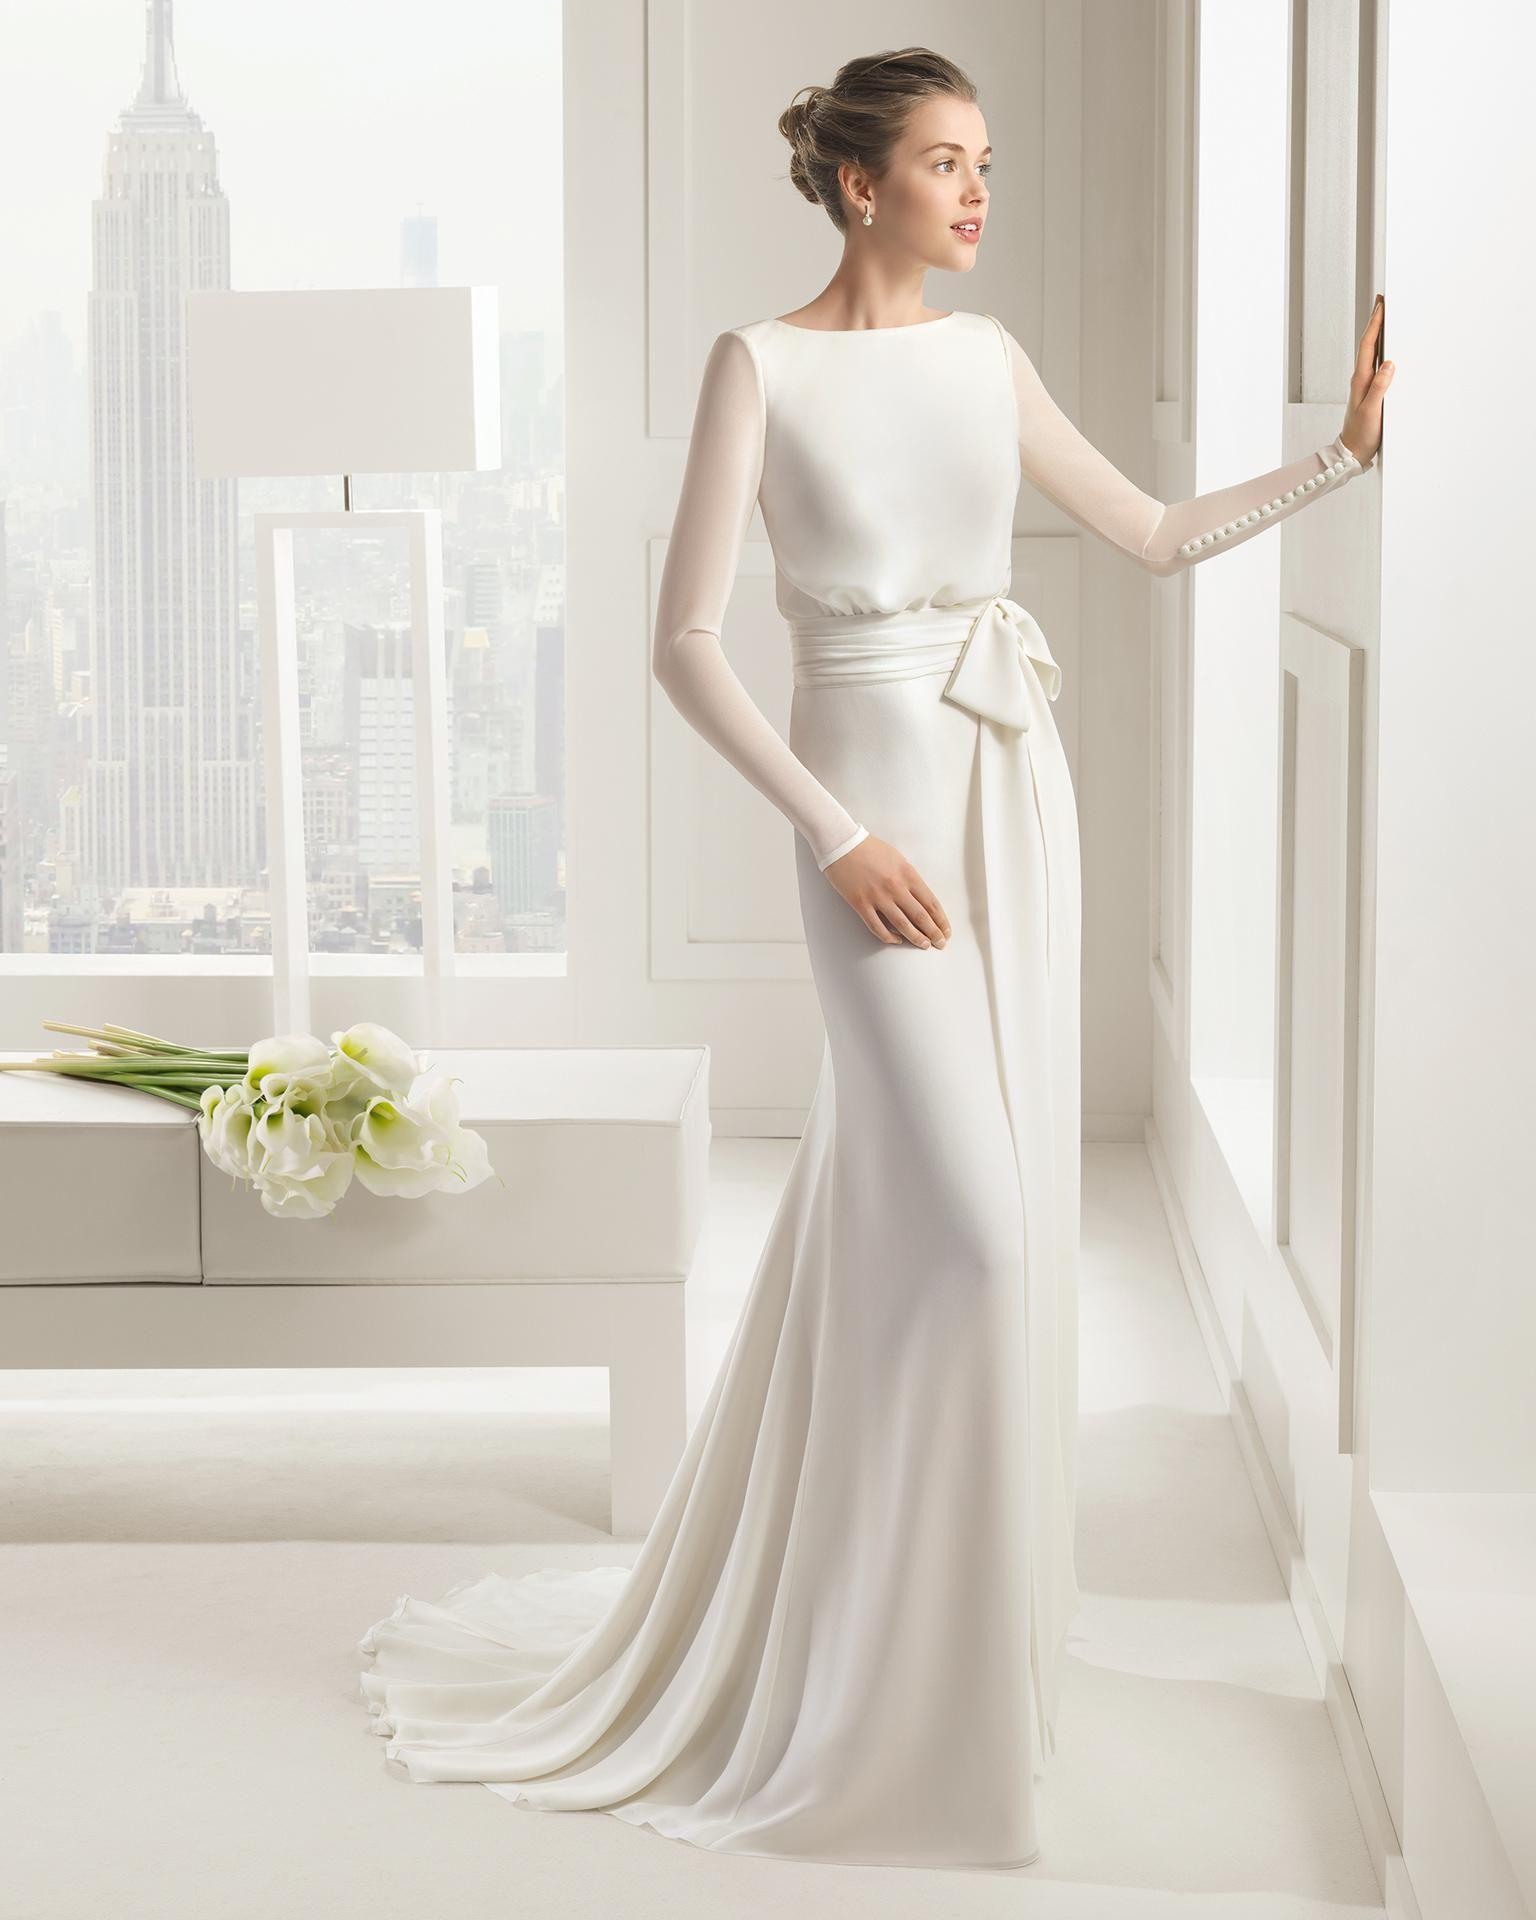 2015 Ivory Chiffon Bridal Dress Long Sleeve A Line Court Train